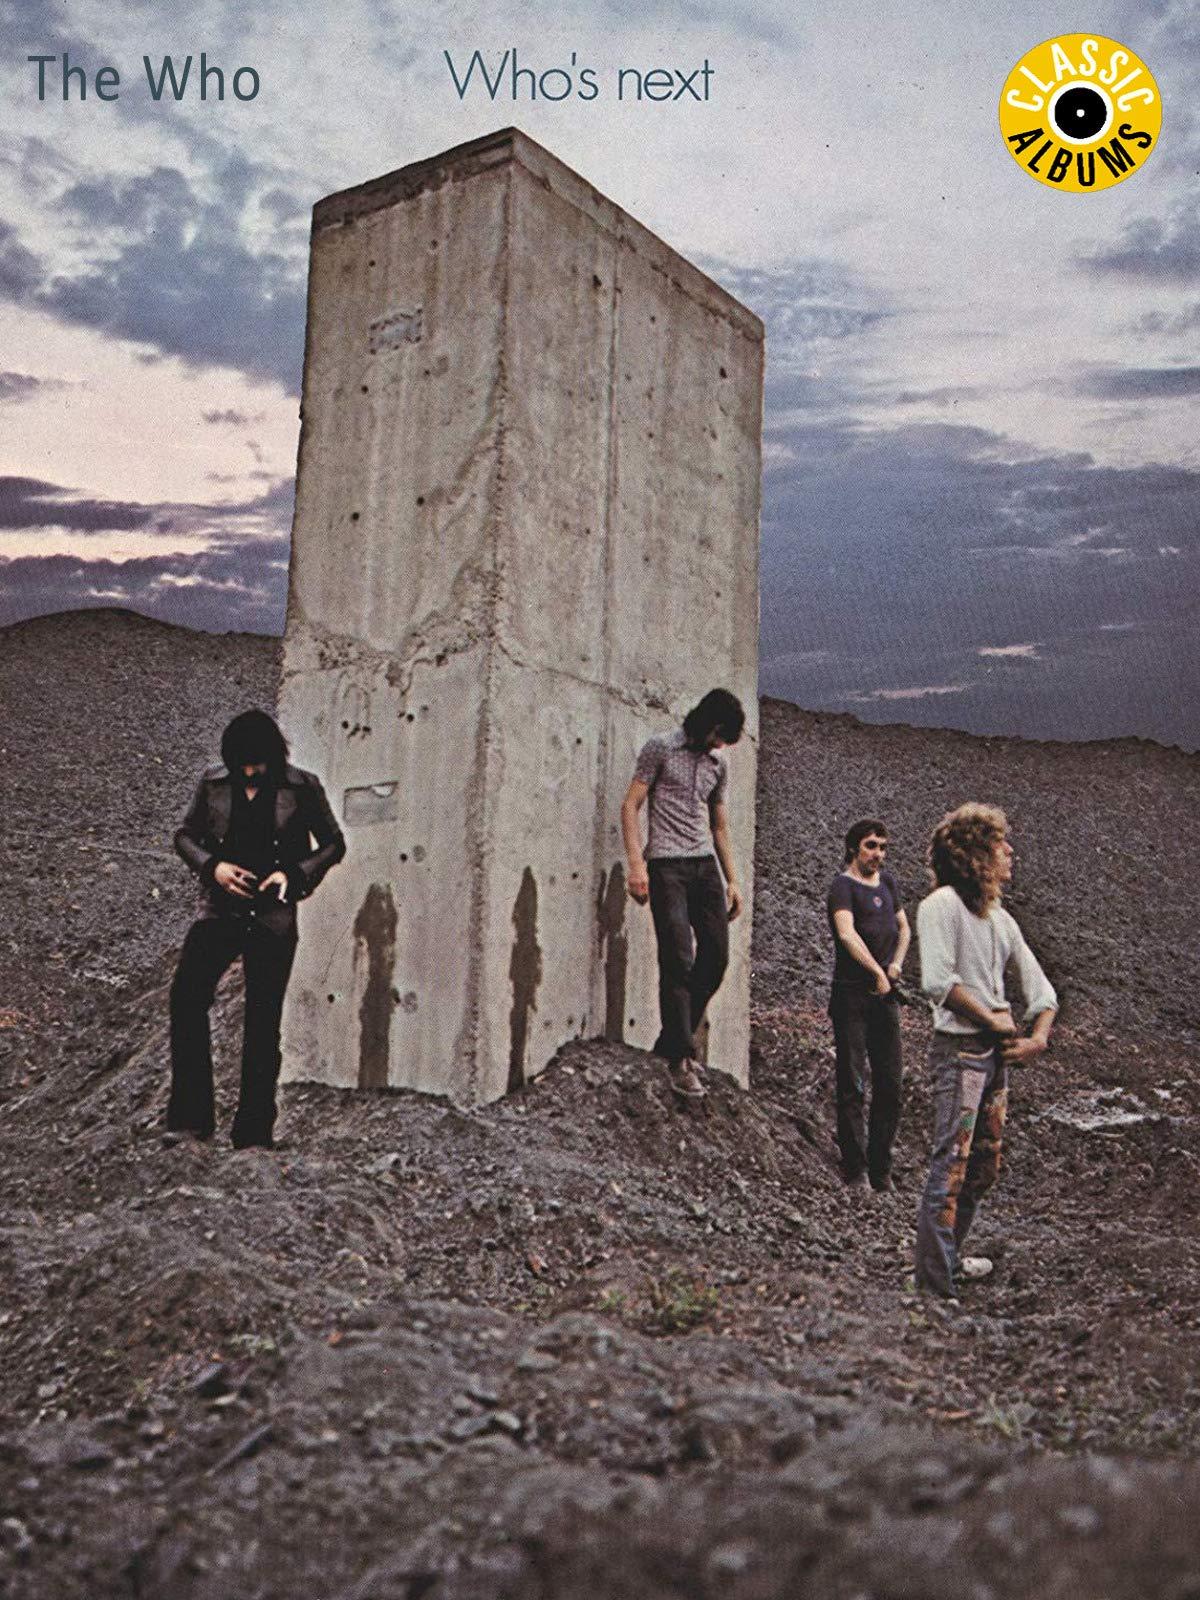 The Who - Who's Next (Classic Album) on Amazon Prime Video UK